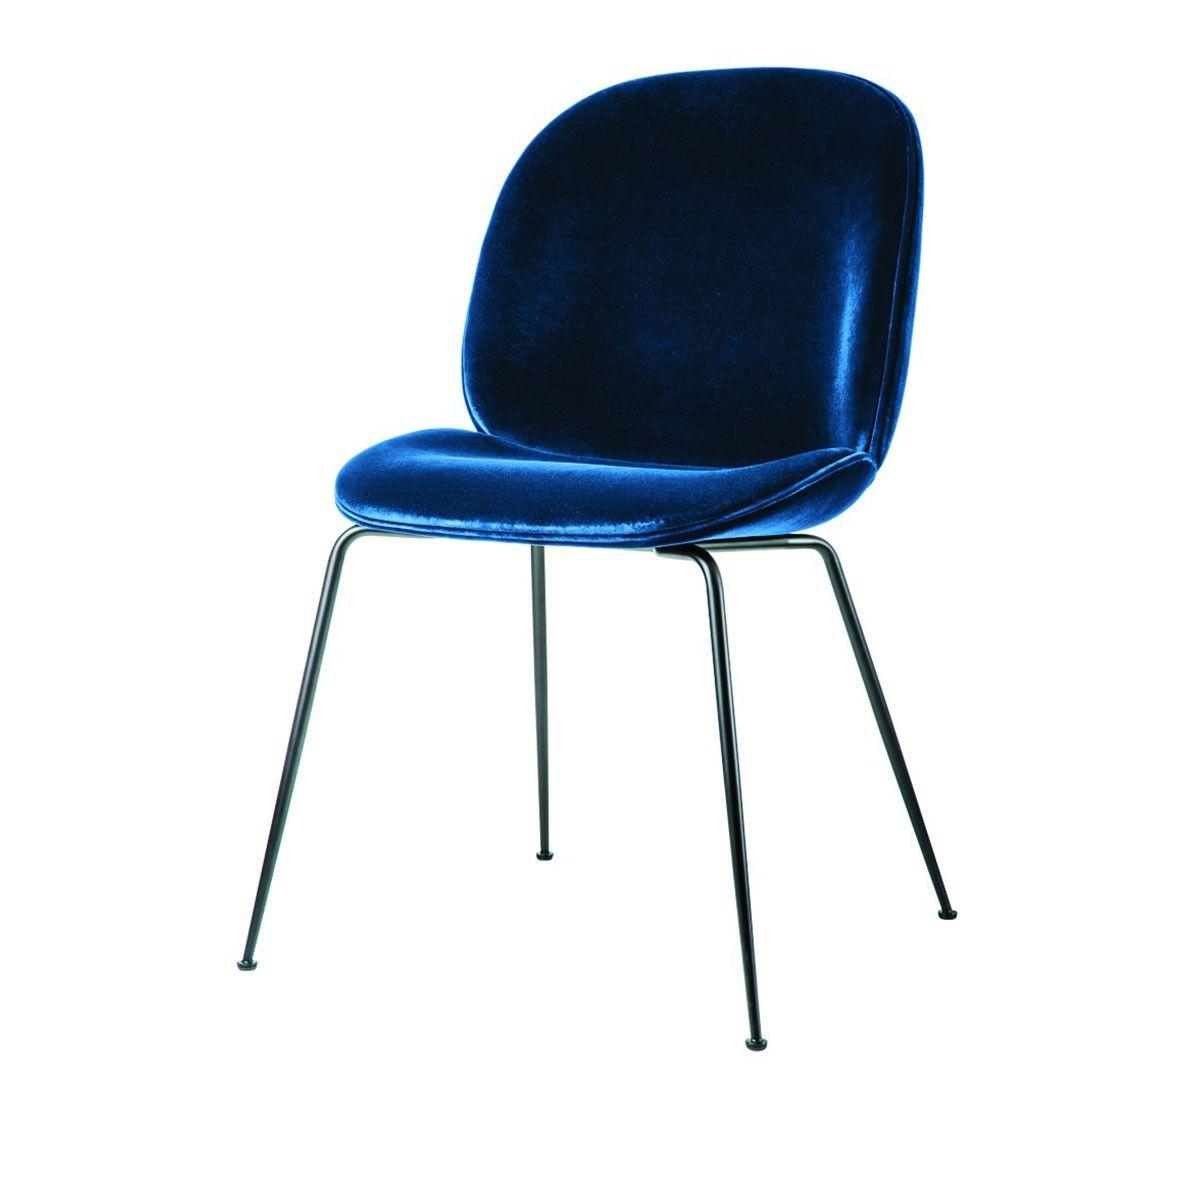 Chaise Beetle Velours Bleu Pieds Noirs Gubi Velours Bleu Chaise De Salle A Manger Chaise